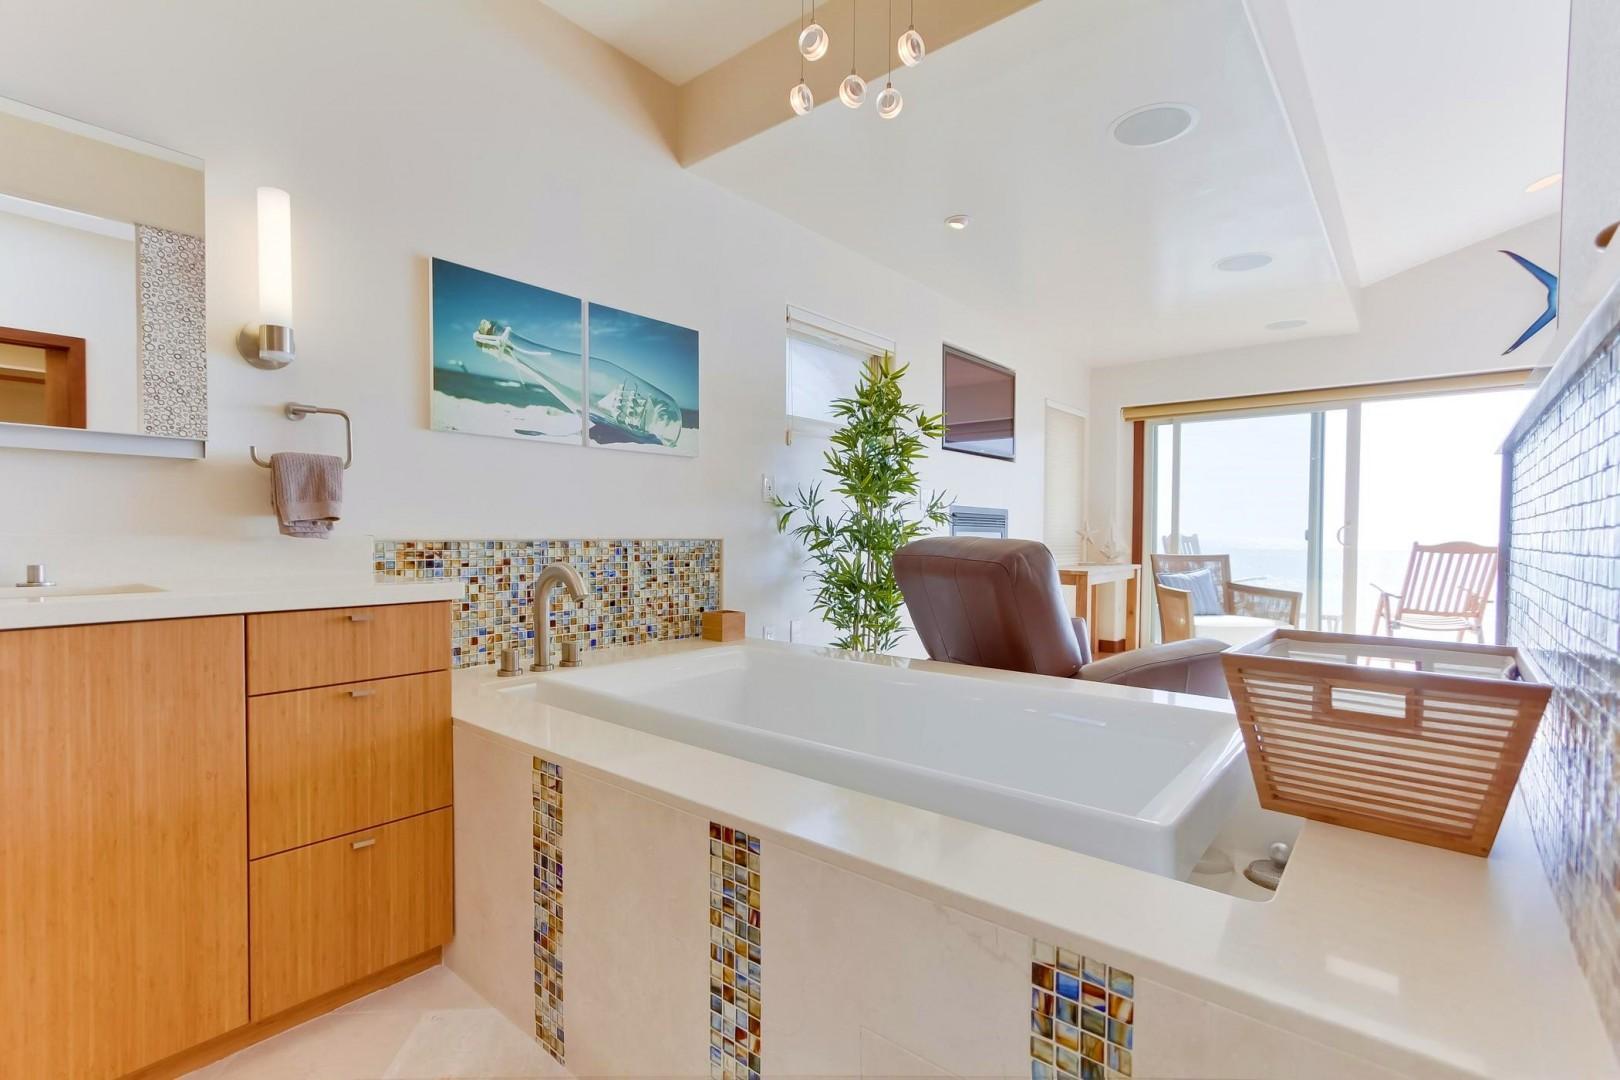 Master bath deep soaking tub